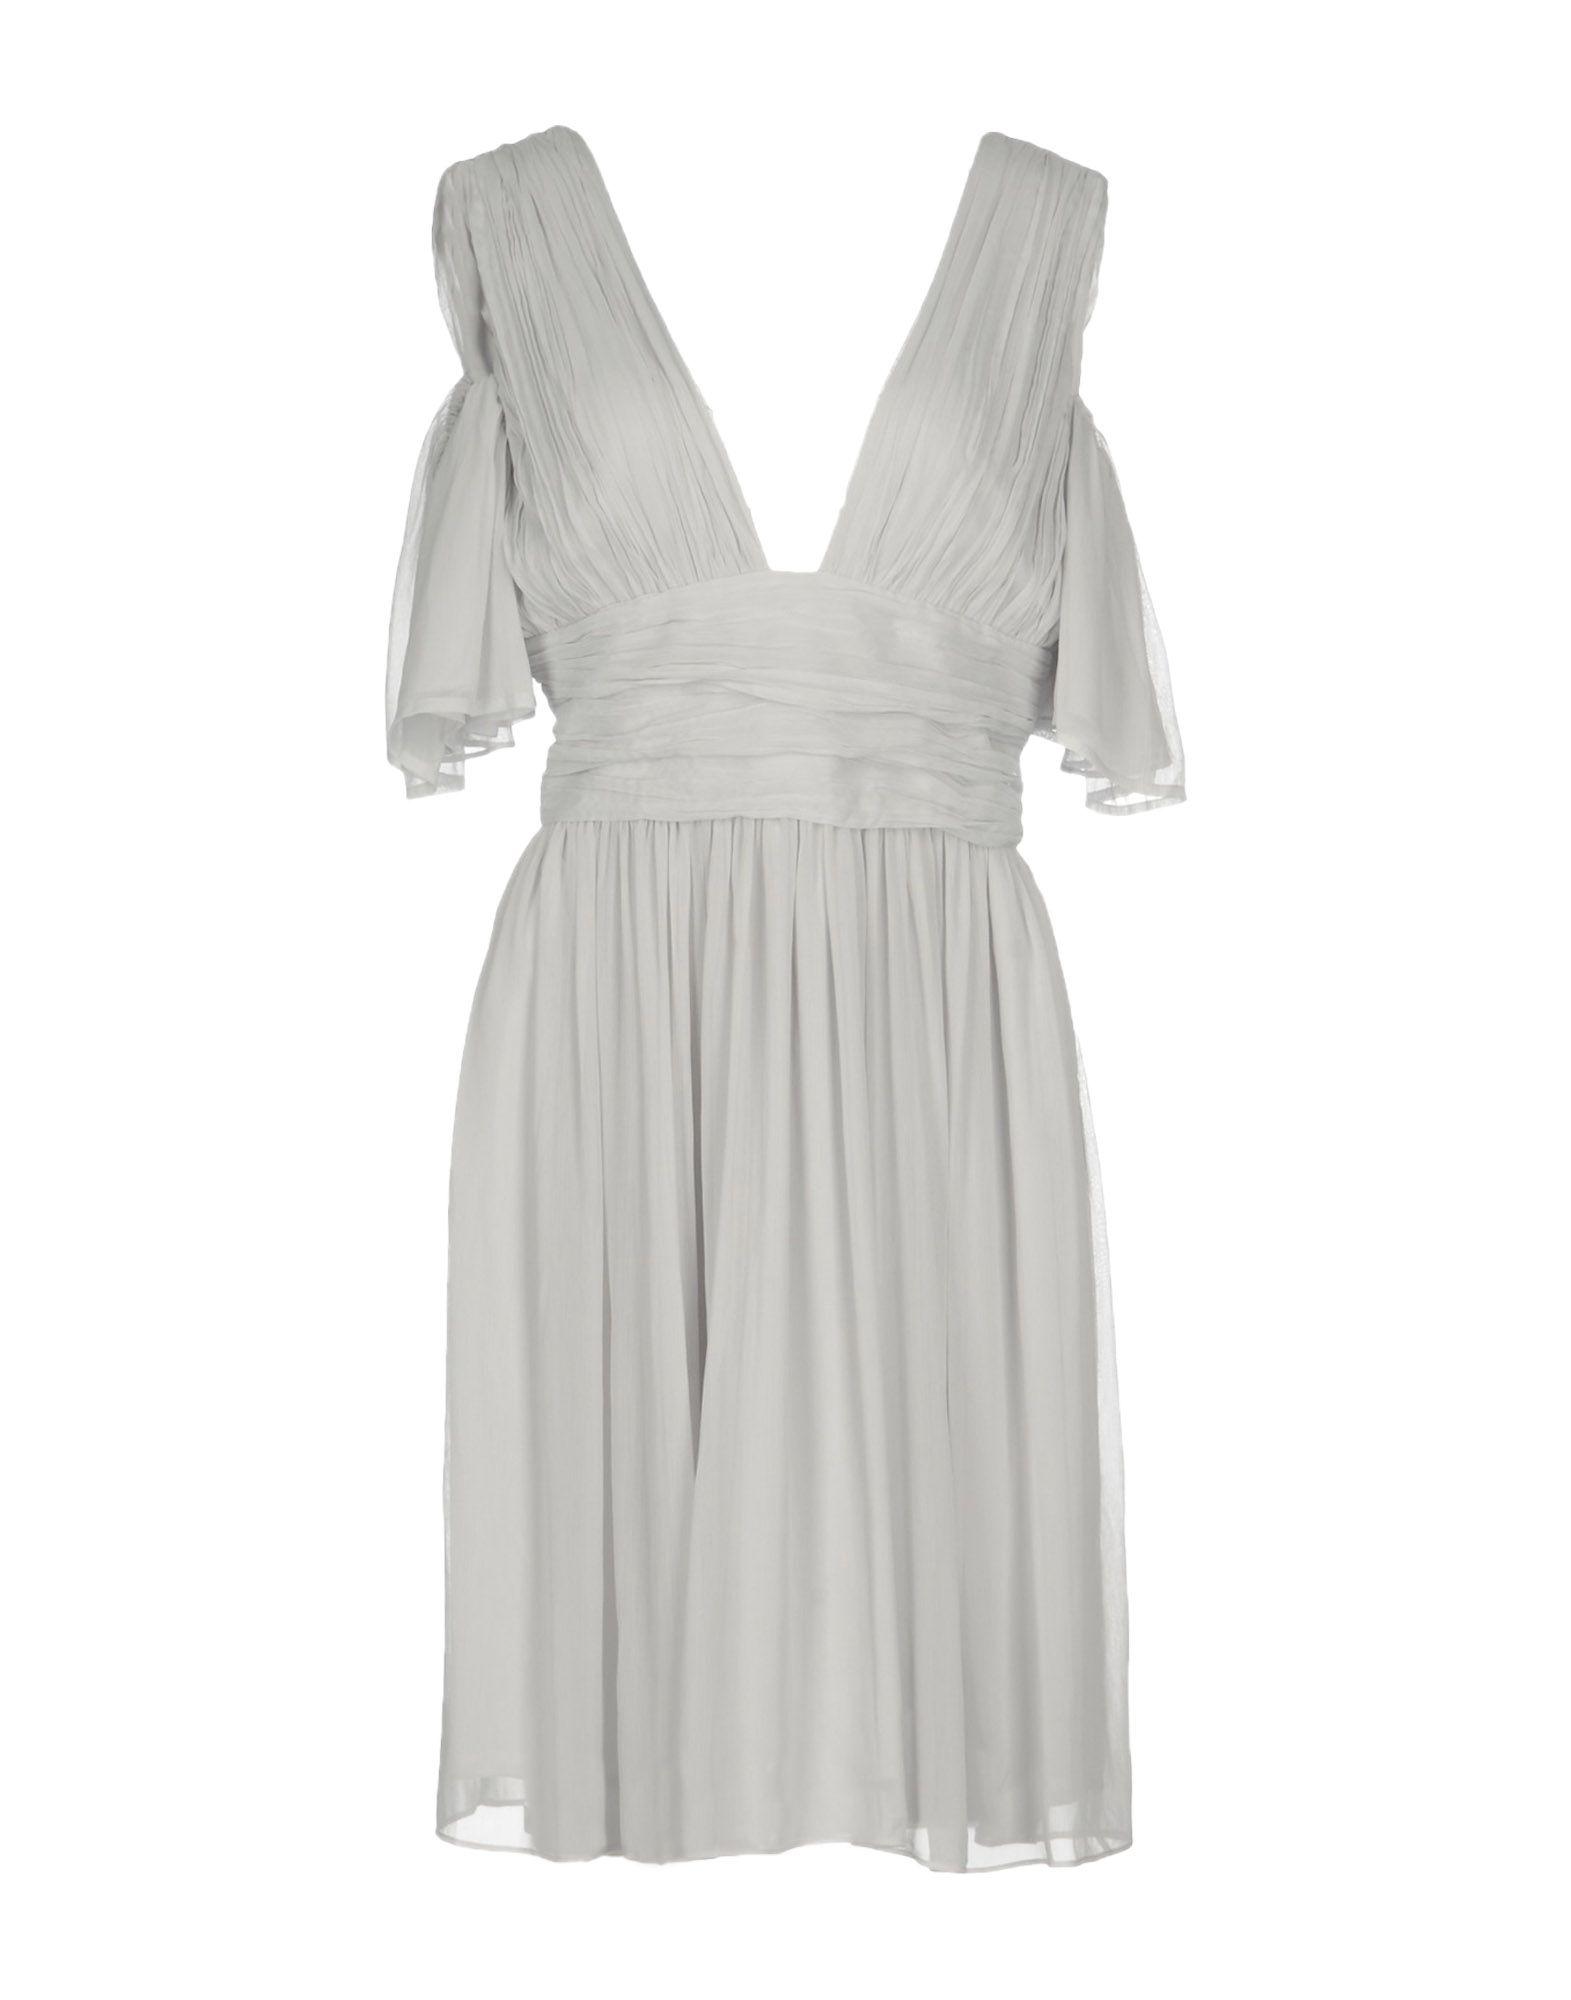 08064f73c3 Yoox - Γυναικεία Κοντά Φορέματα